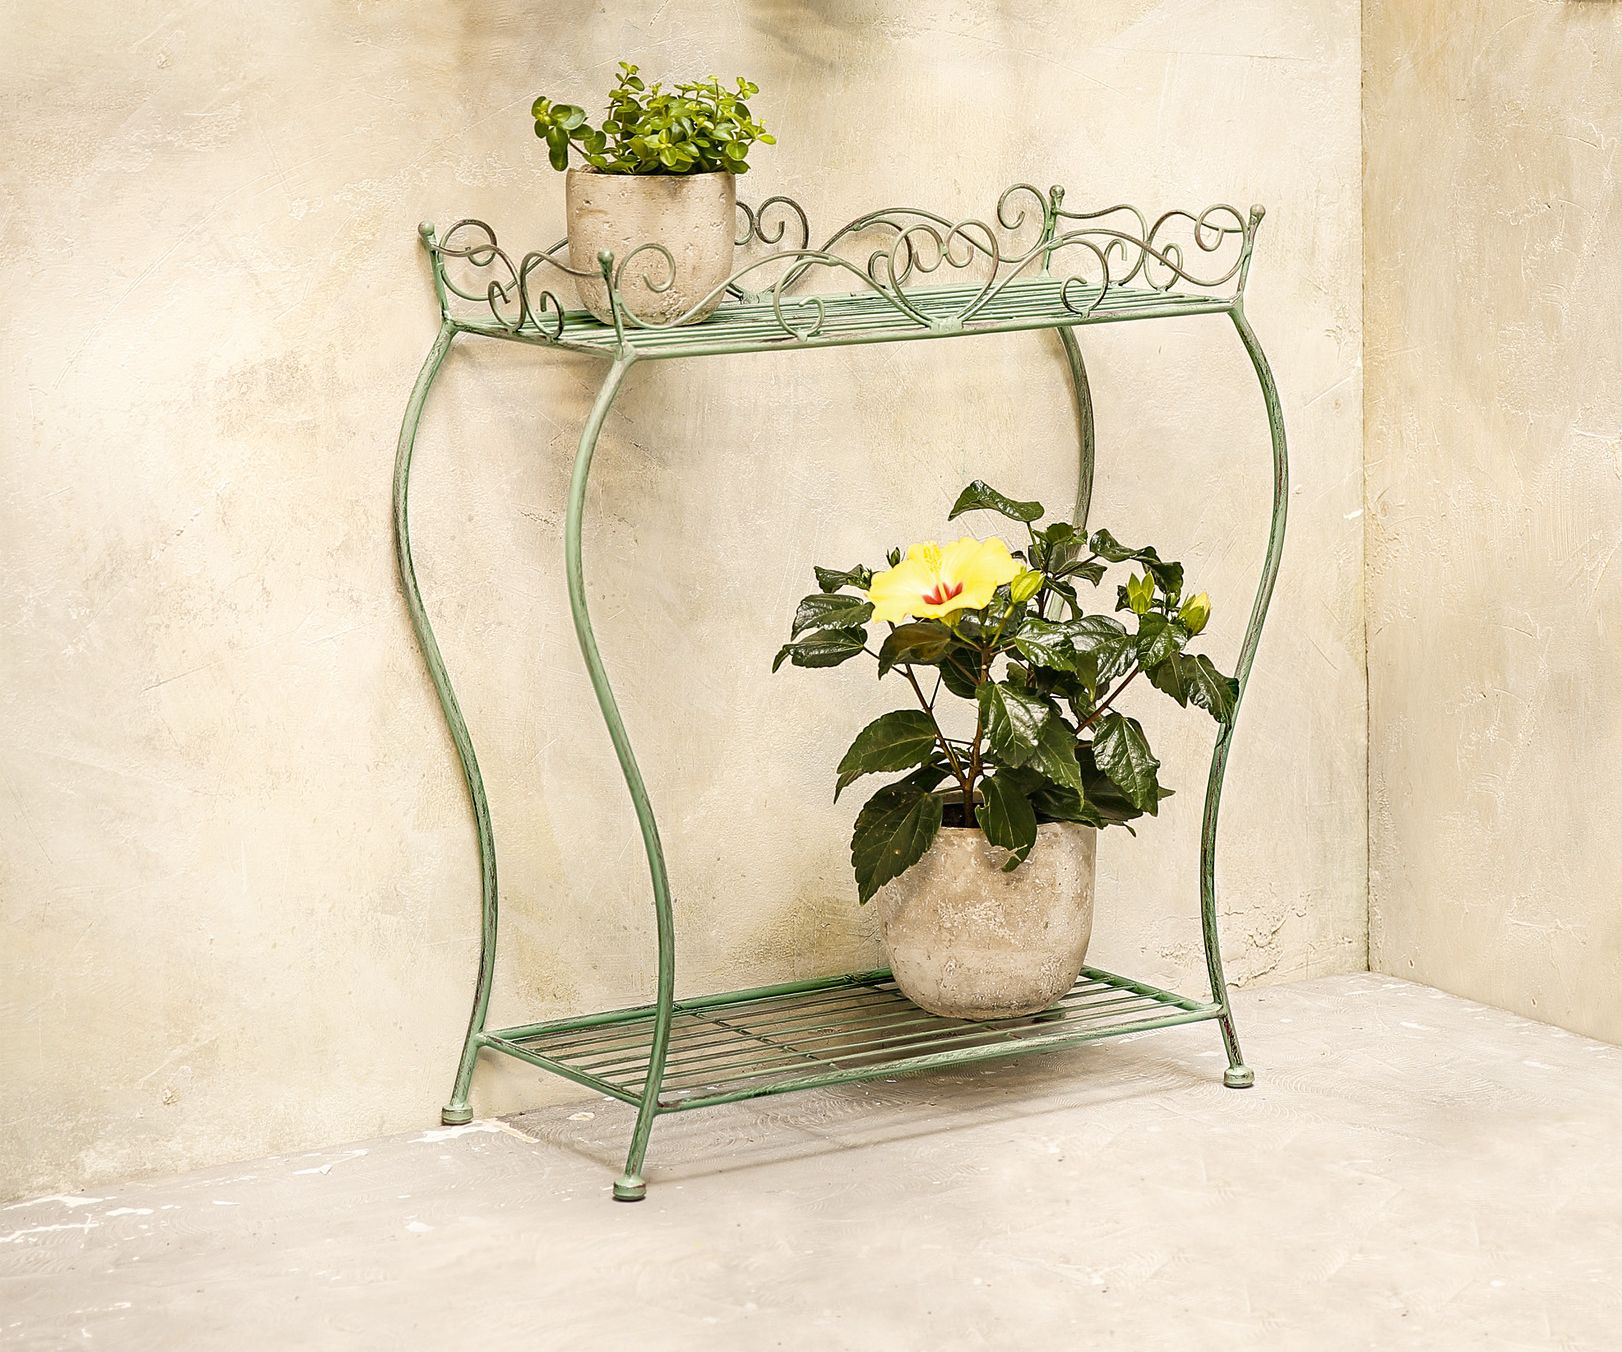 Stand Regal Ranken Aus Metall Antik Design Fur Blumen Pflanzen